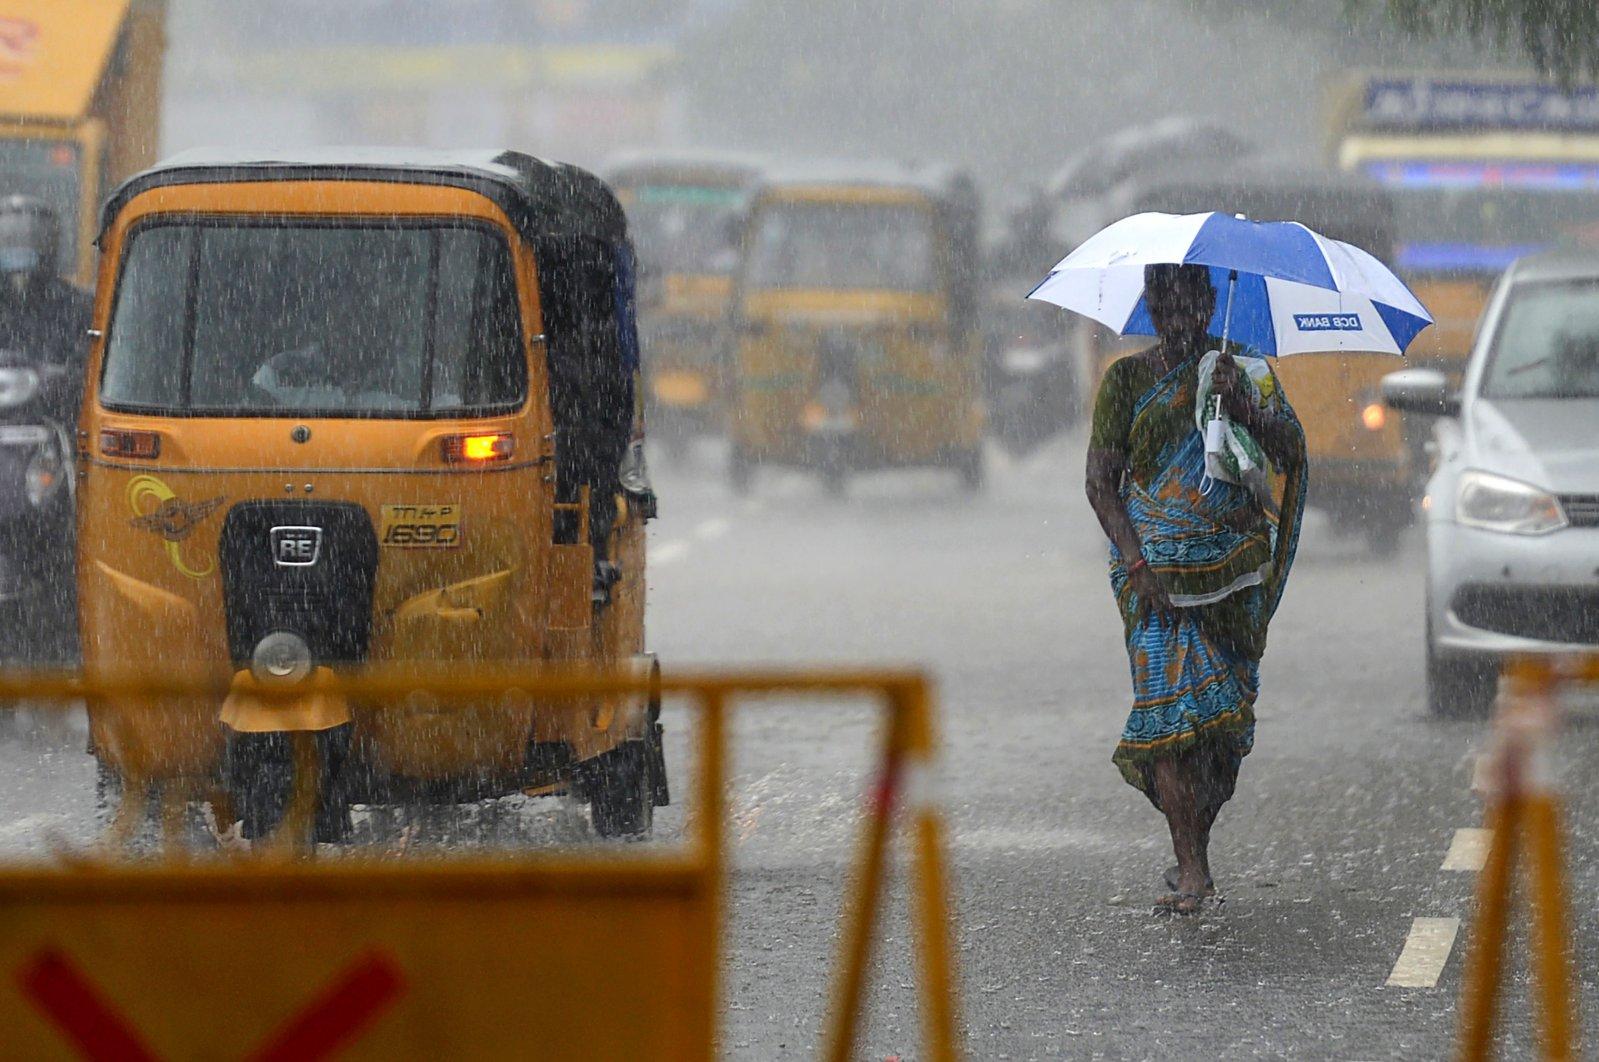 A women walks under an umbrella during heavy rains as cyclone Nivar approaches the eastern Indian coast, in Chennai, India, Nov. 24, 2020. (AFP Photo)